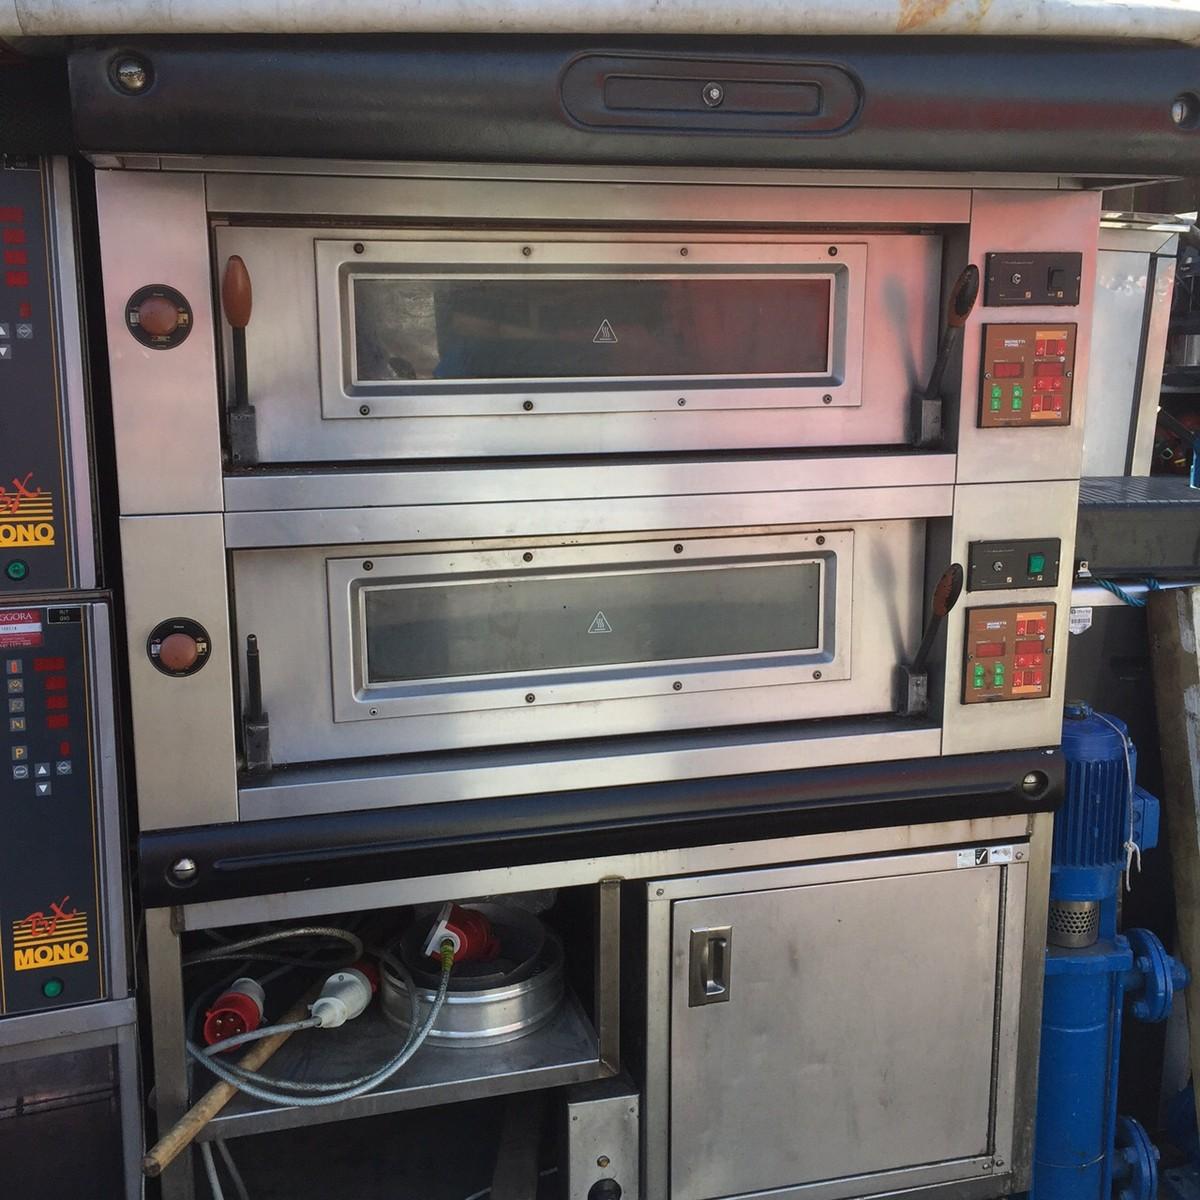 Moretti Forni Pizza Ovensecondhand Catering Equipment Pizza Ovens